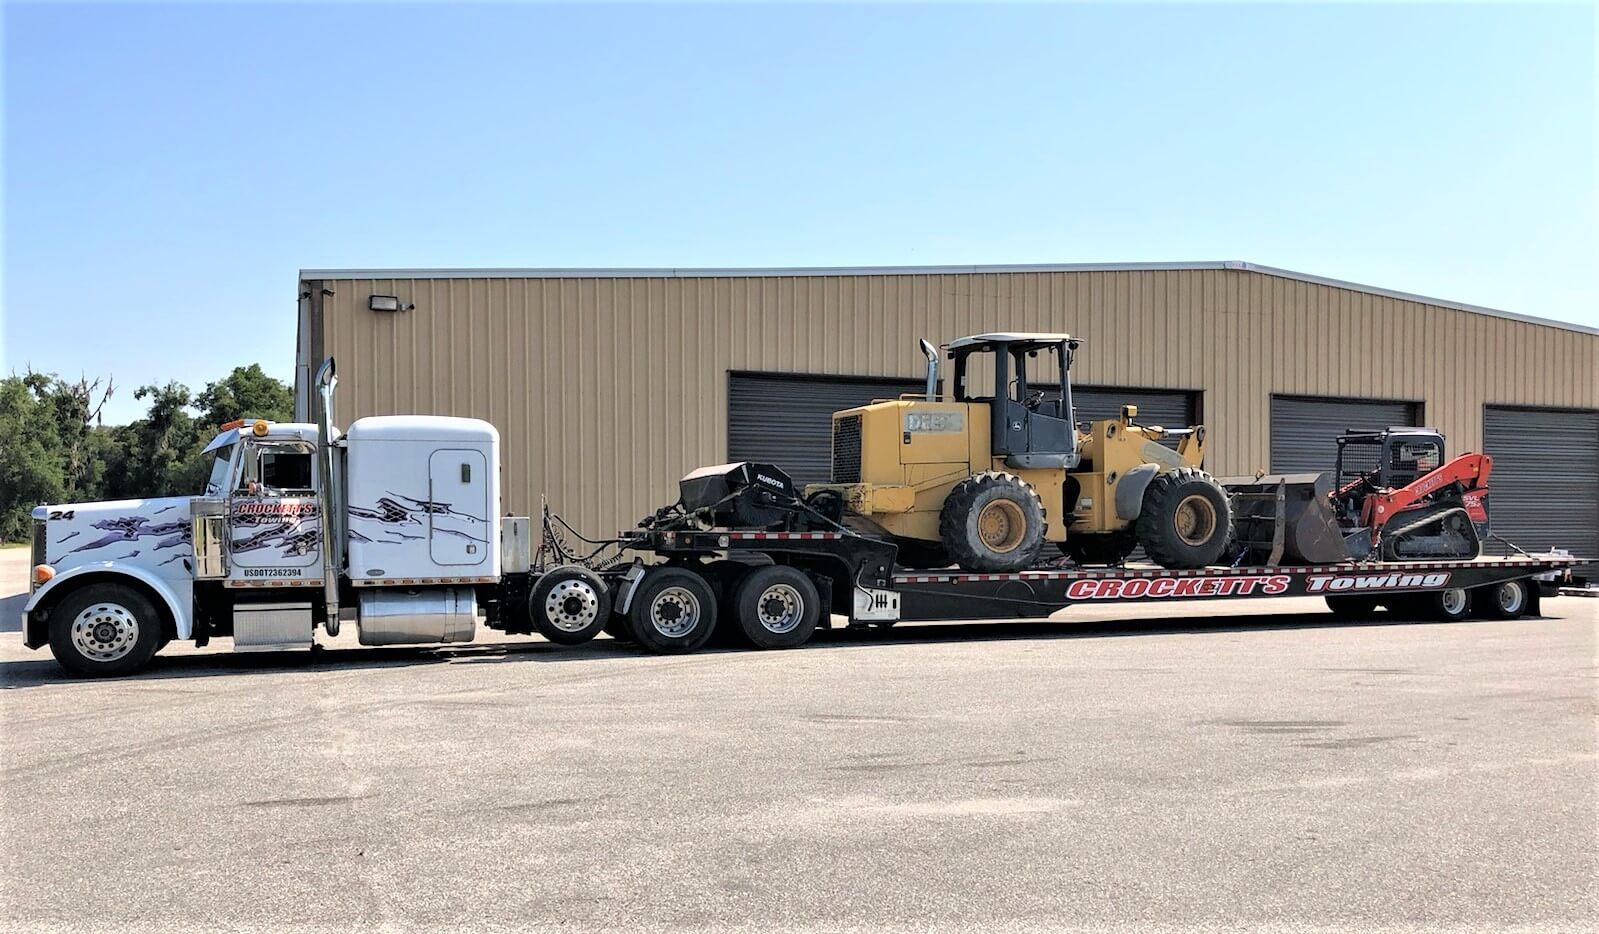 Professional truck transporting construction equipment